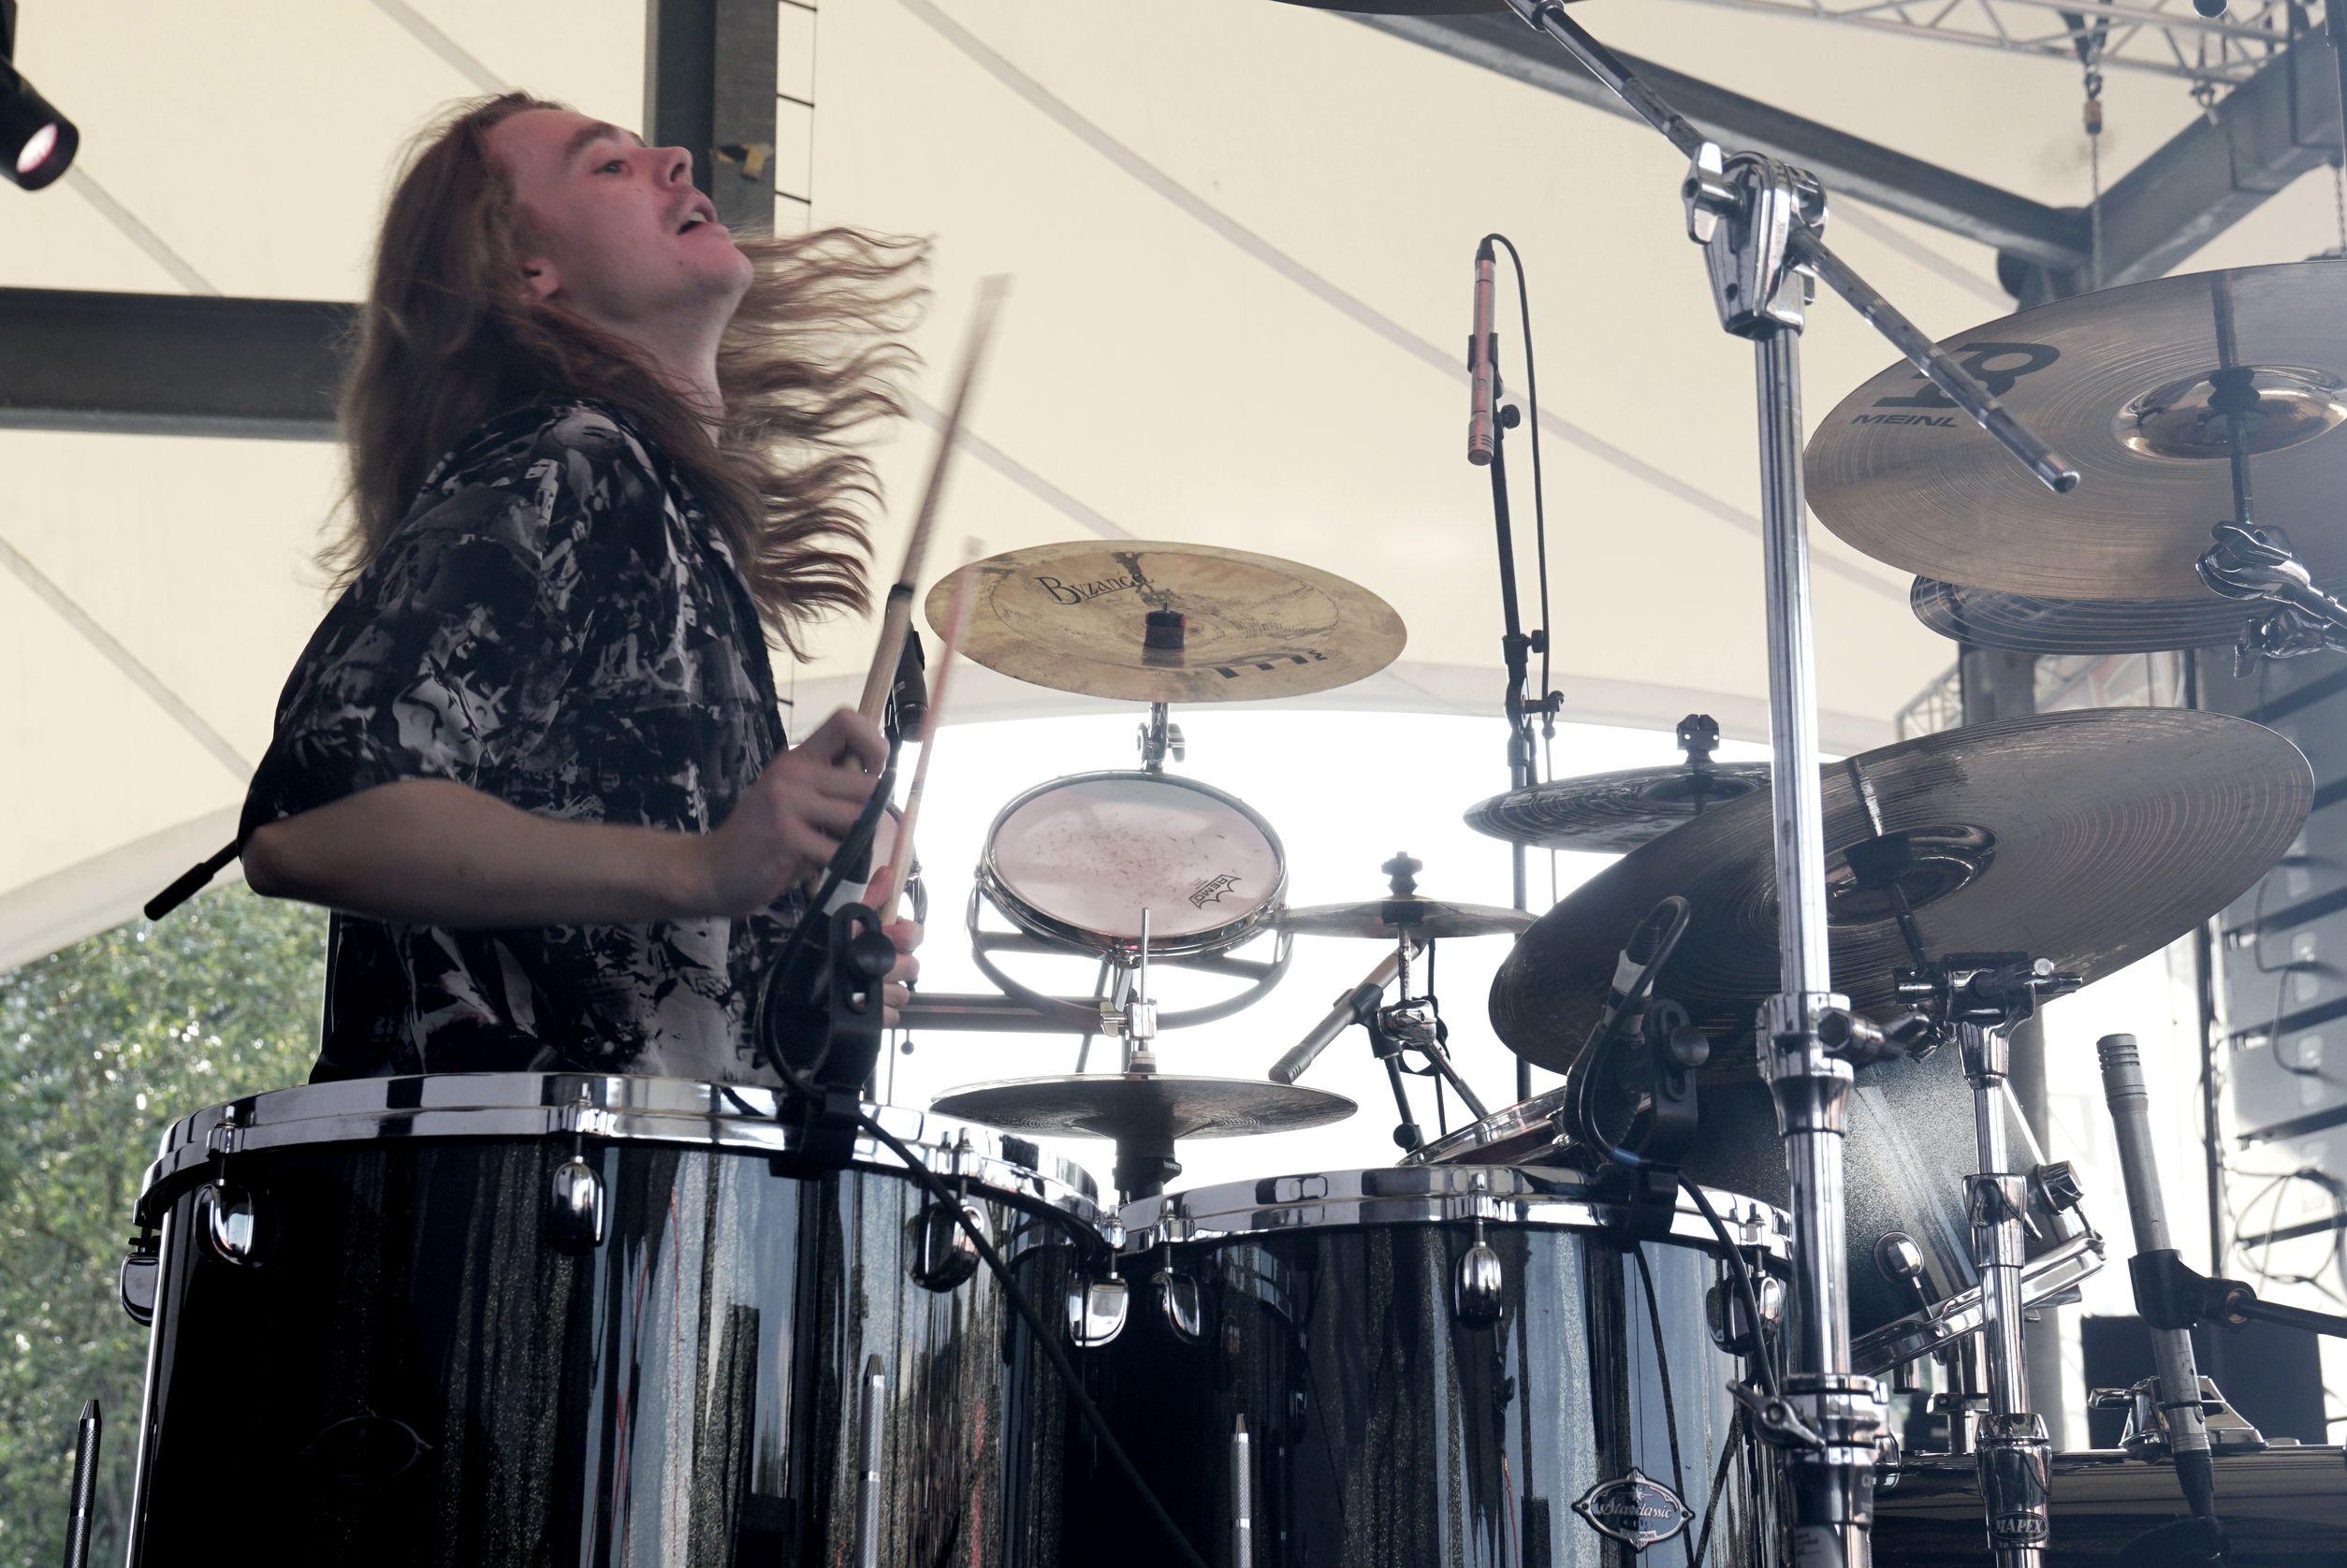 Rock-Hard-Festival-2021-One-Day-The-Very-End-Asphyx-Rage-Motorjesus-Wolfskull-Darkness-Scorched-Oak-Amphitheater-Gelsenkirchen_3